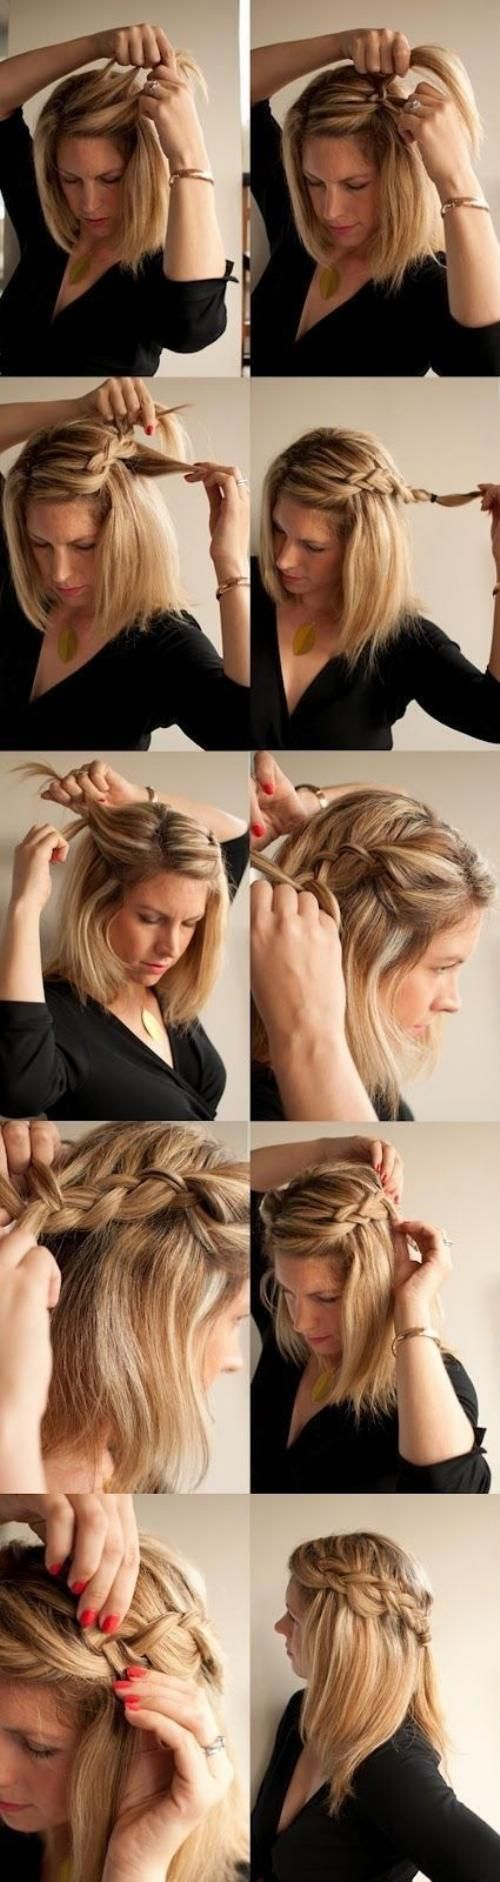 10 cute styles